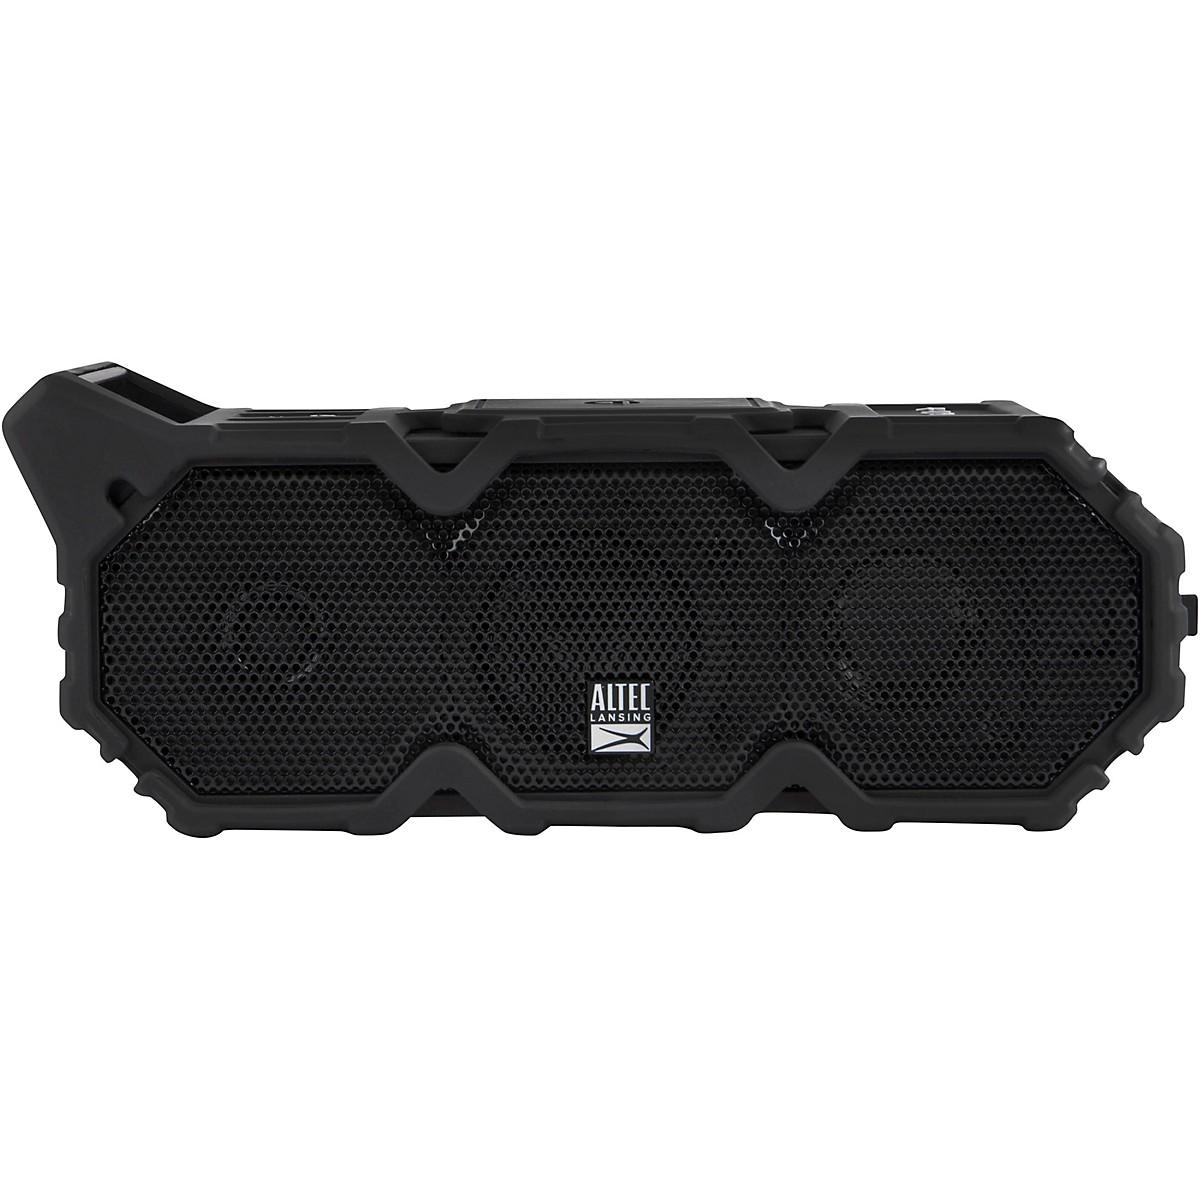 Altec Lansing LifeJacket XL Jolt Portable Waterproof Bluetooth Speaker